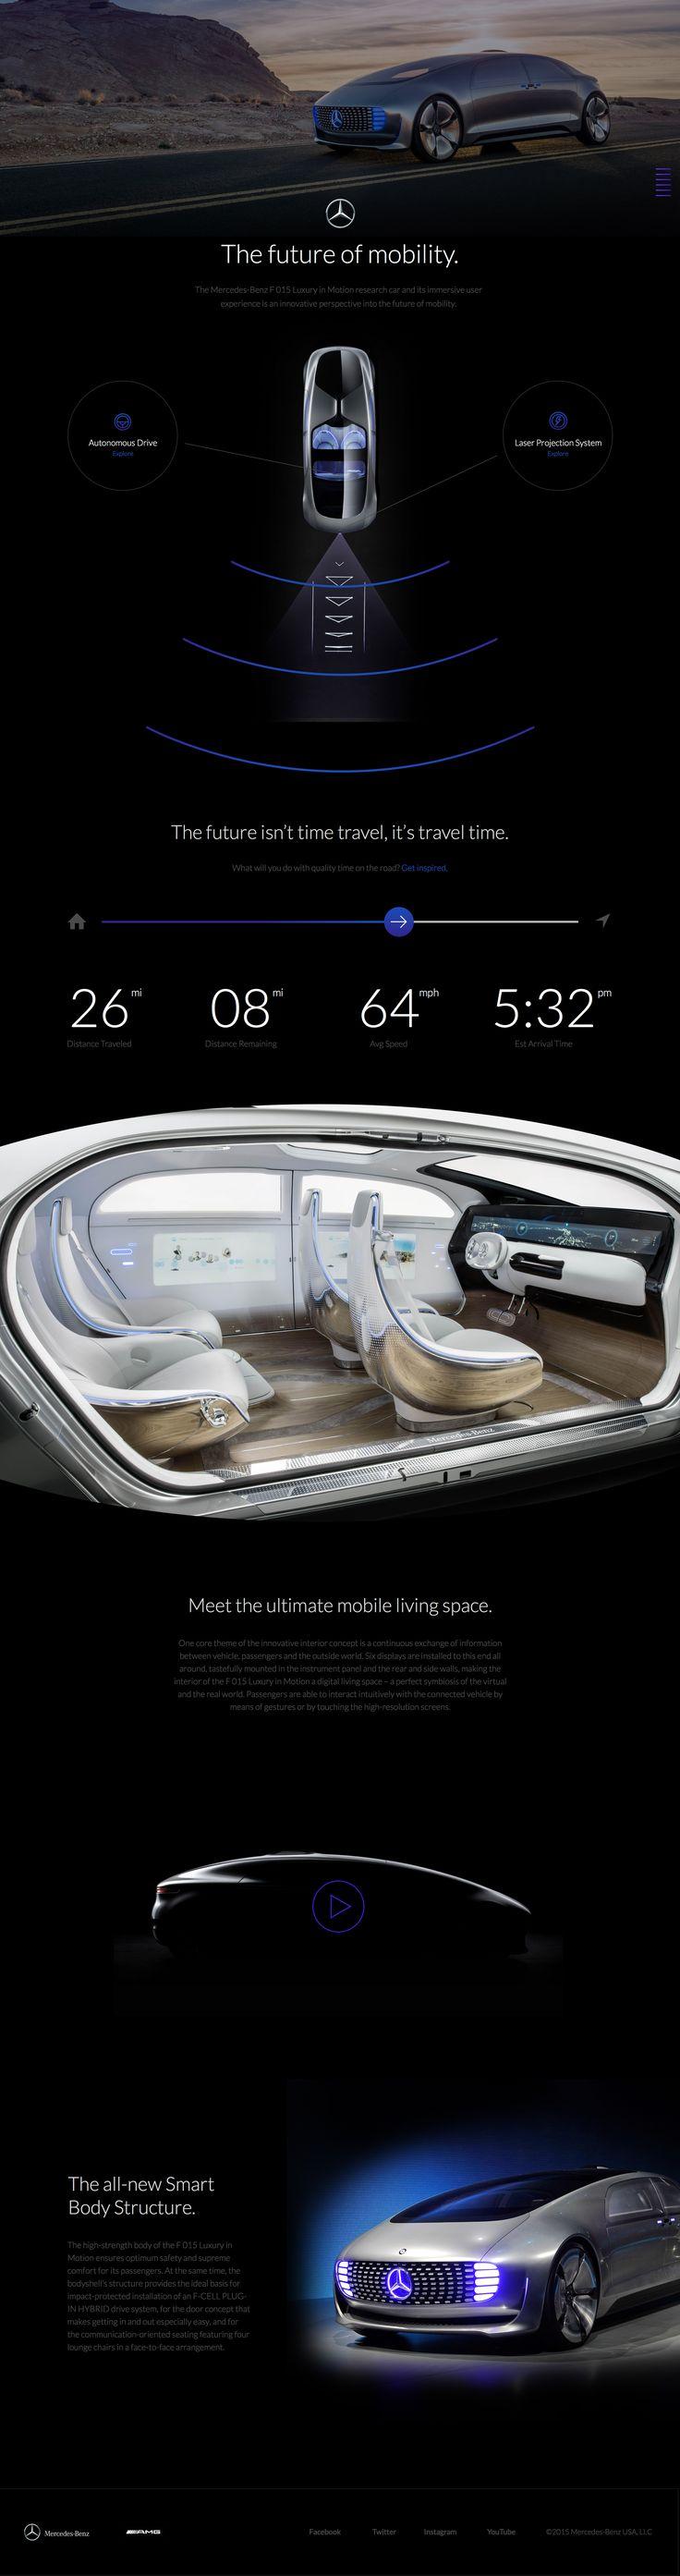 Mercedes Benz site design